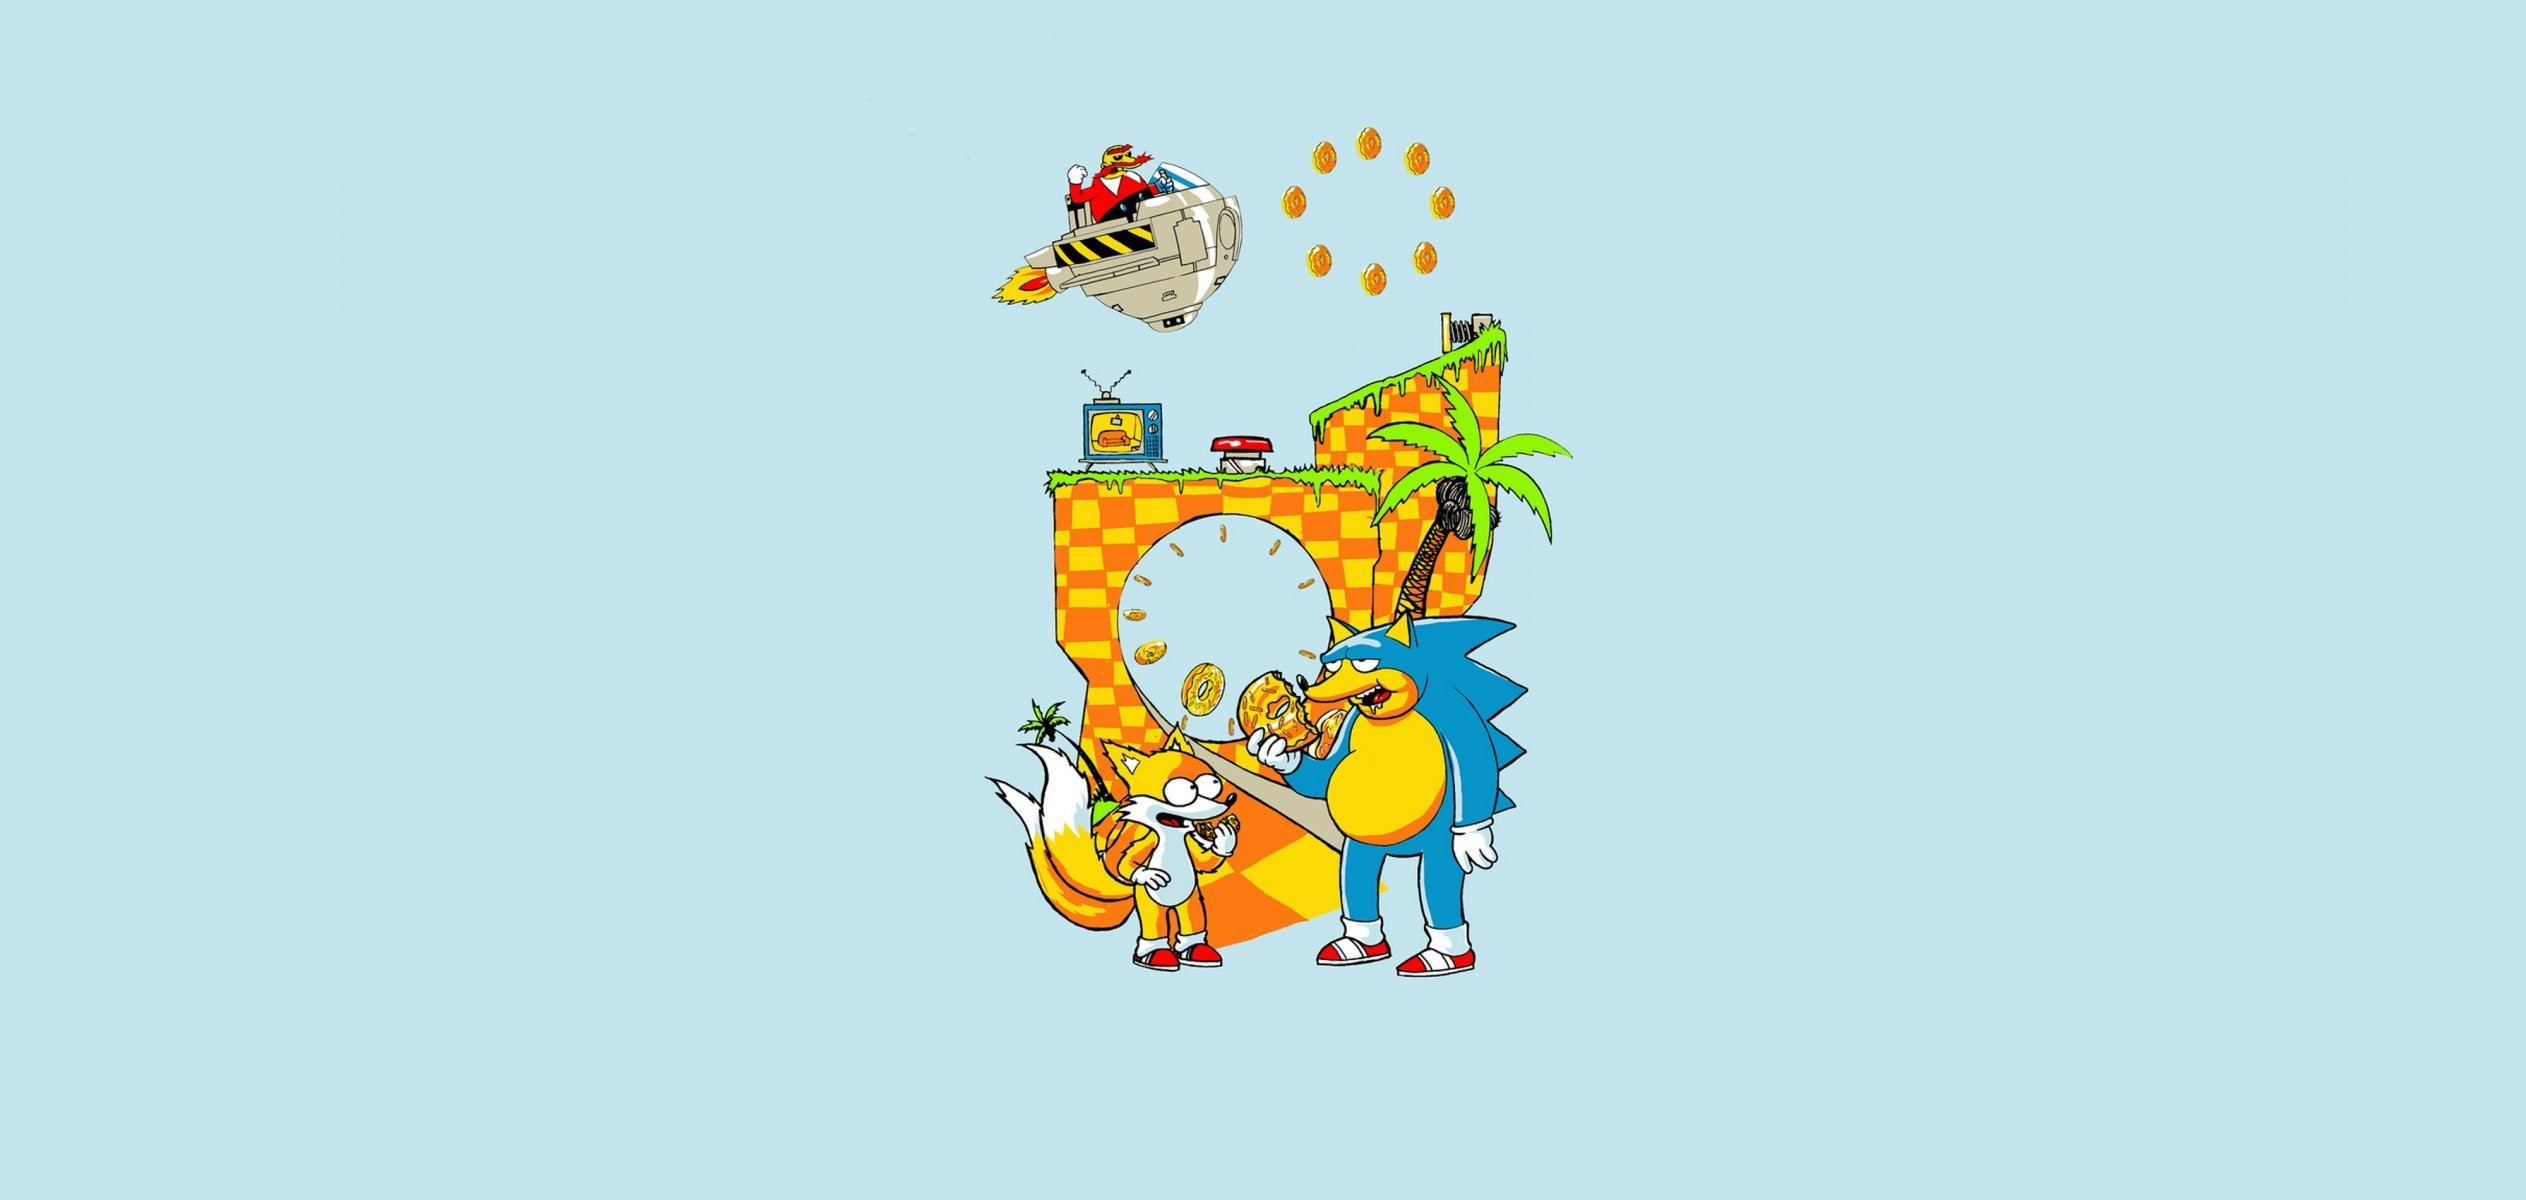 sonic sonic snickering donuts sega mega drive 16 bit sega a prefix game  childhood nostalgia hedgehog